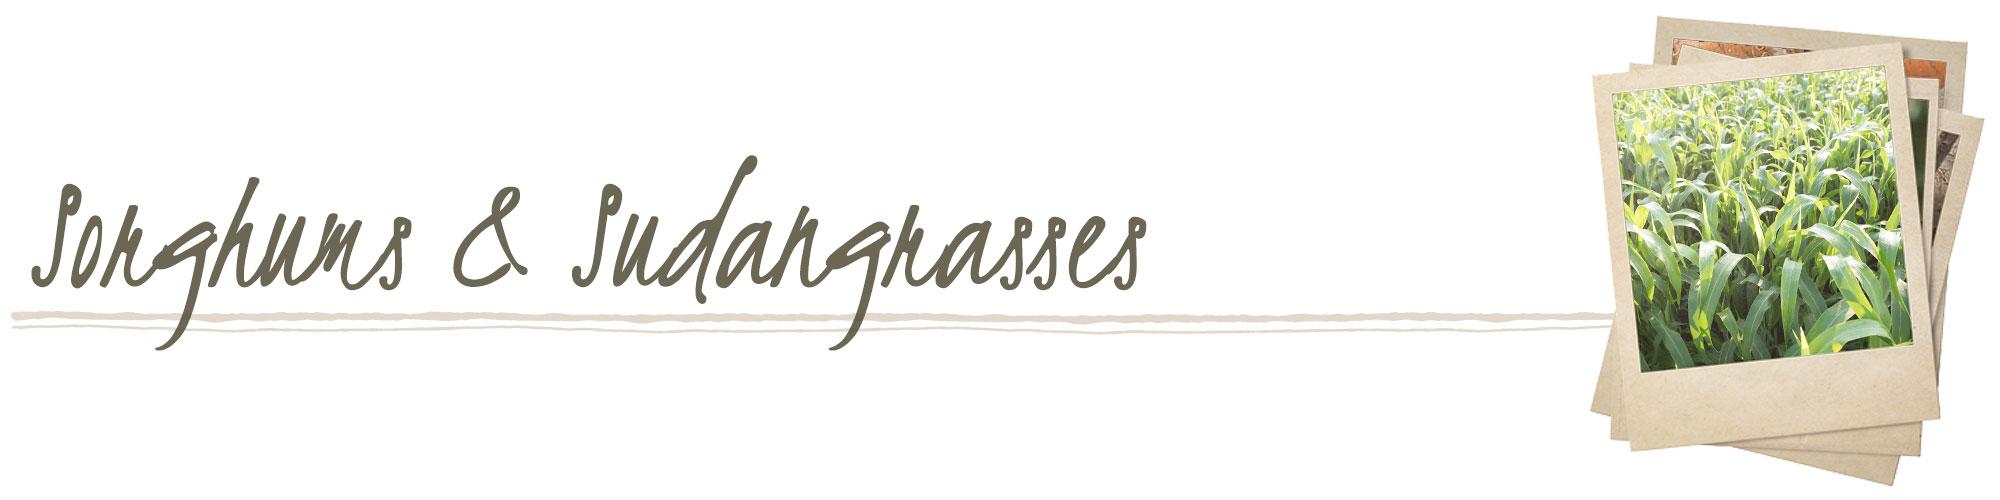 Sorghums & Sudangrasses